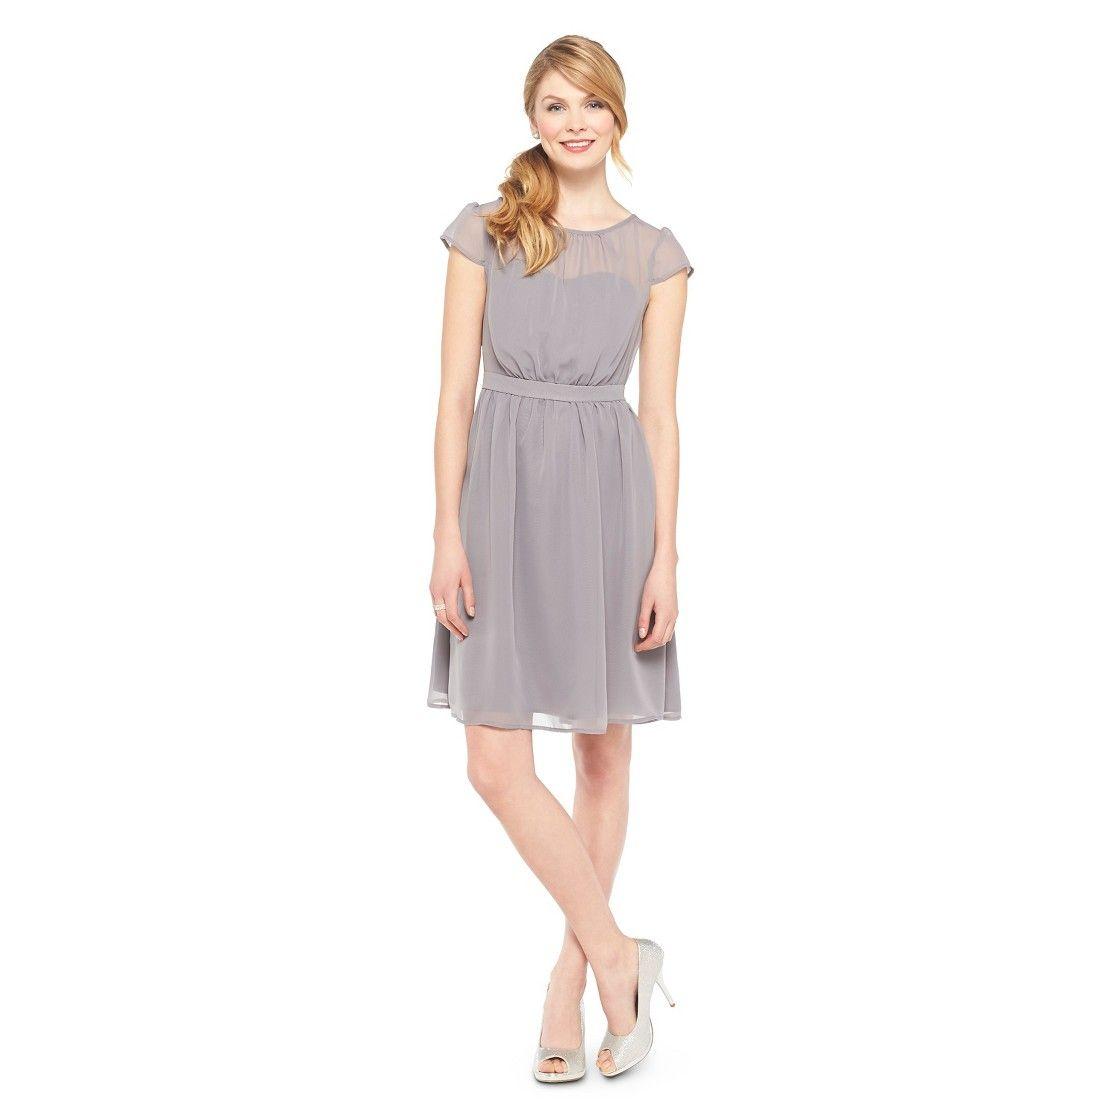 40+ Target wedding bridesmaid dresses ideas in 2021